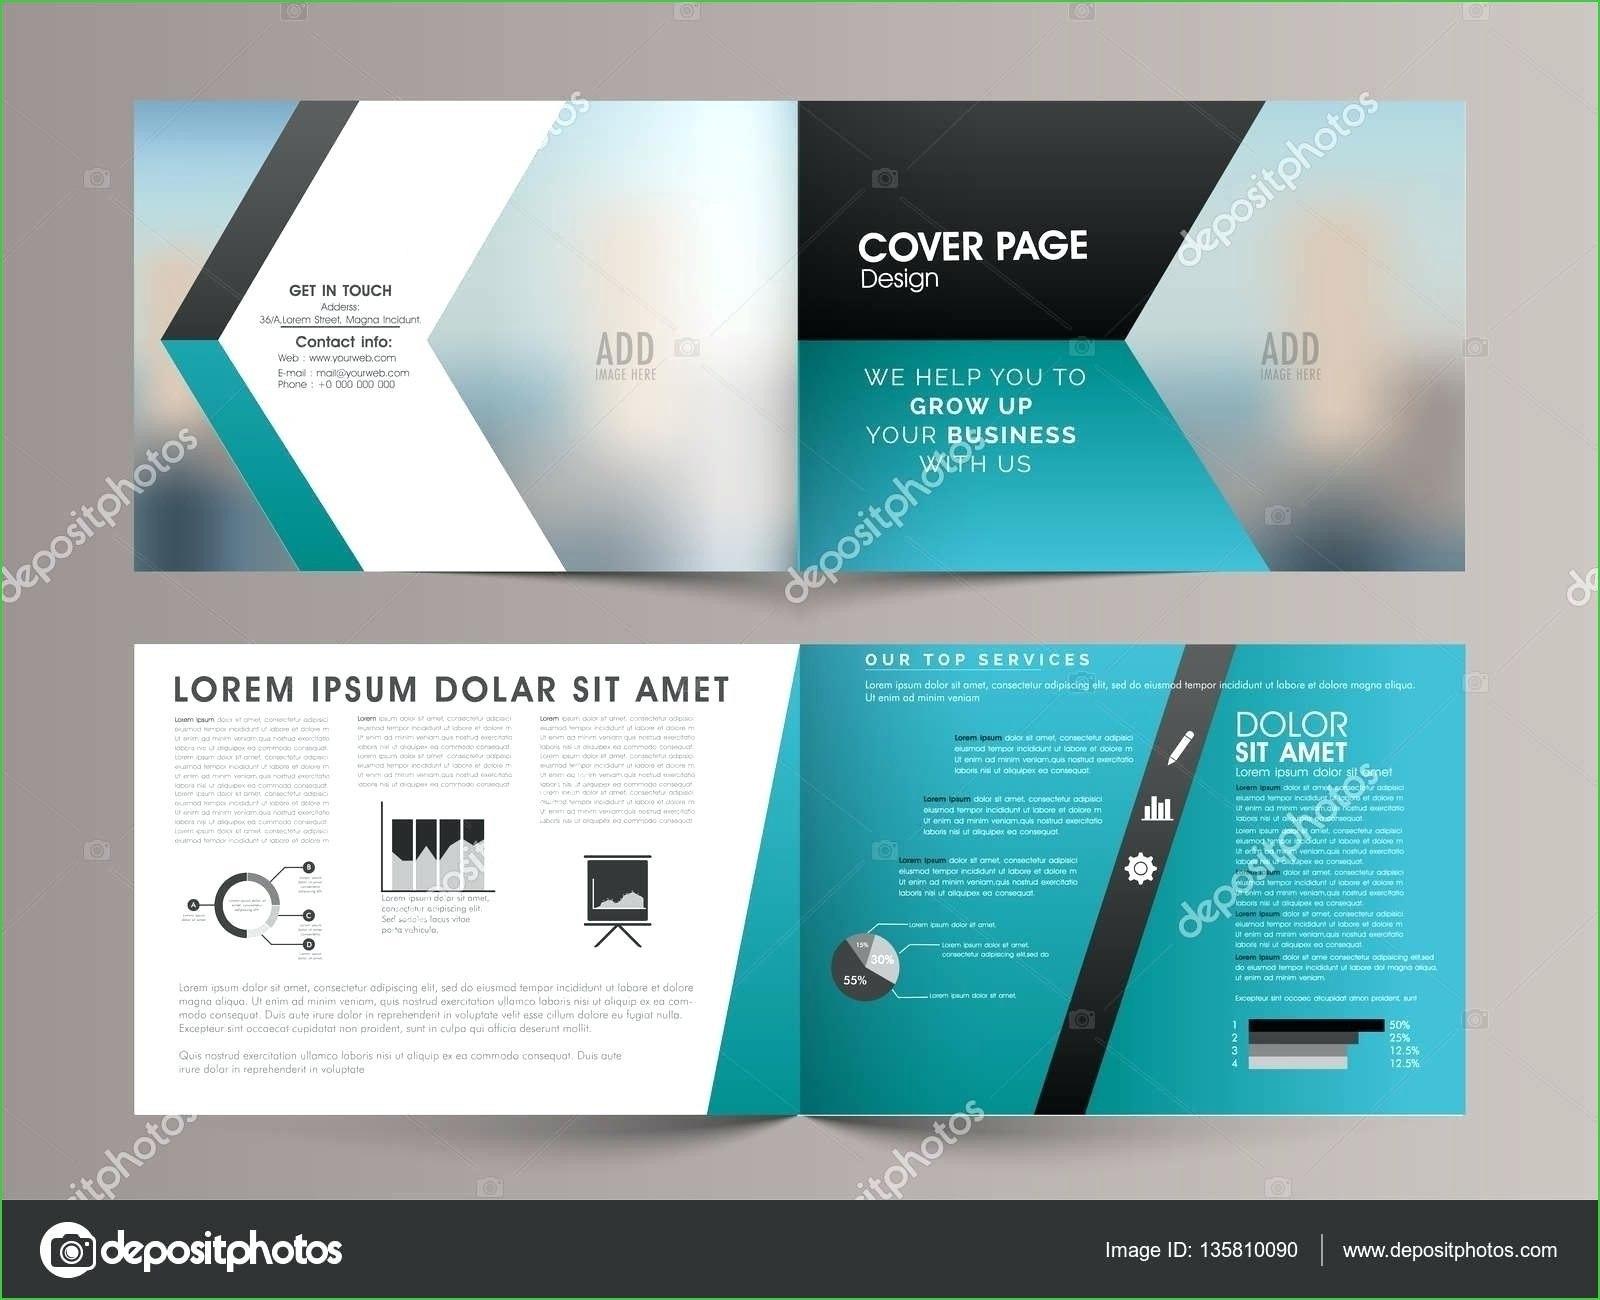 Elegant Creative Flyer Design Templates  Wwwpantrymagic Inside E Brochure Design Templates